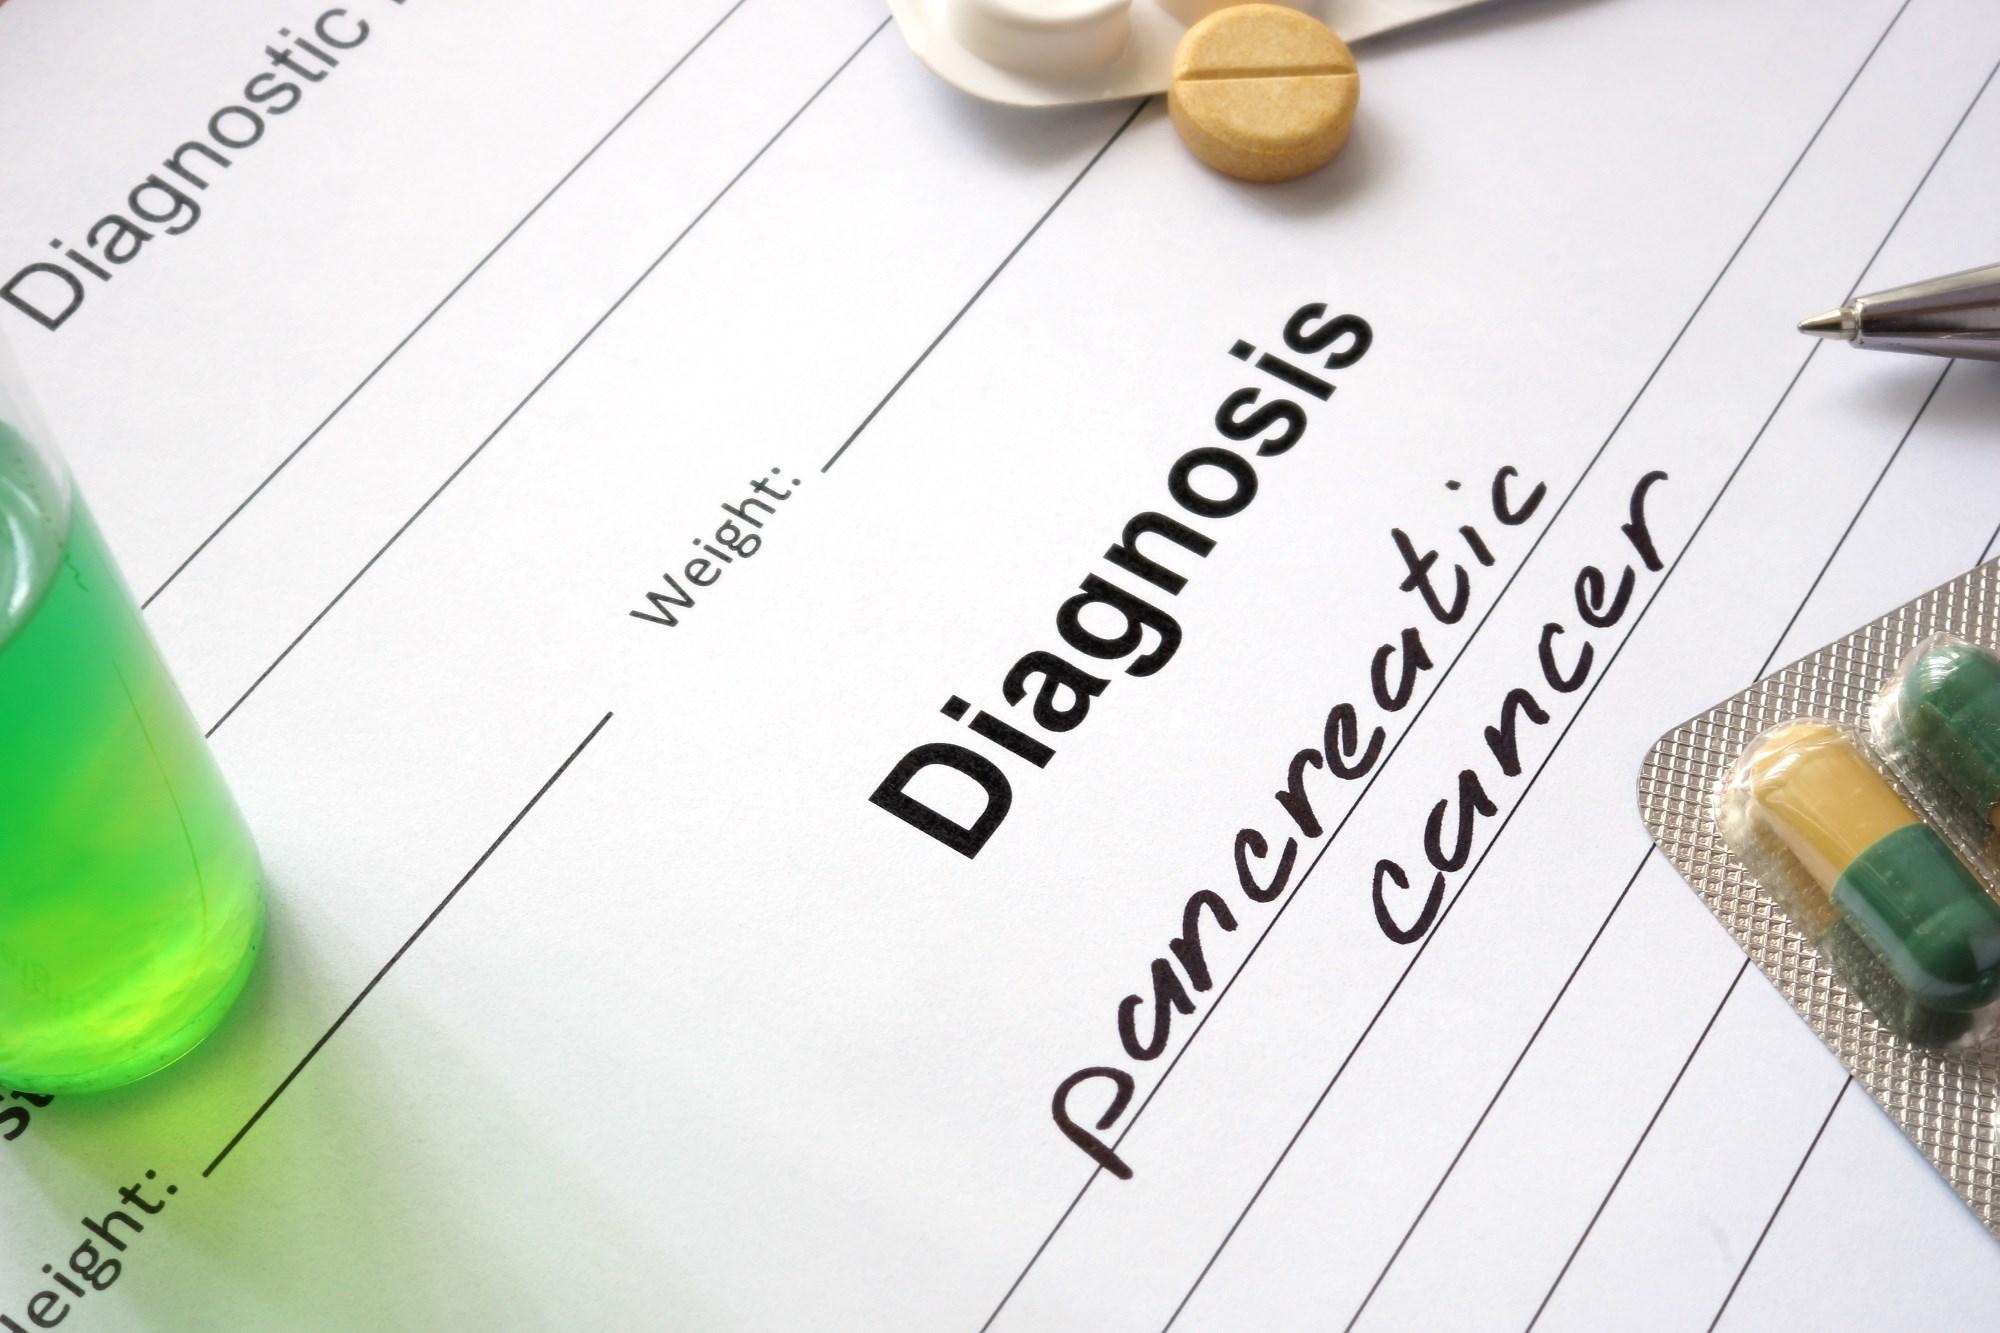 Relacorilant Gets Orphan Drug Designation for Pancreatic Cancer